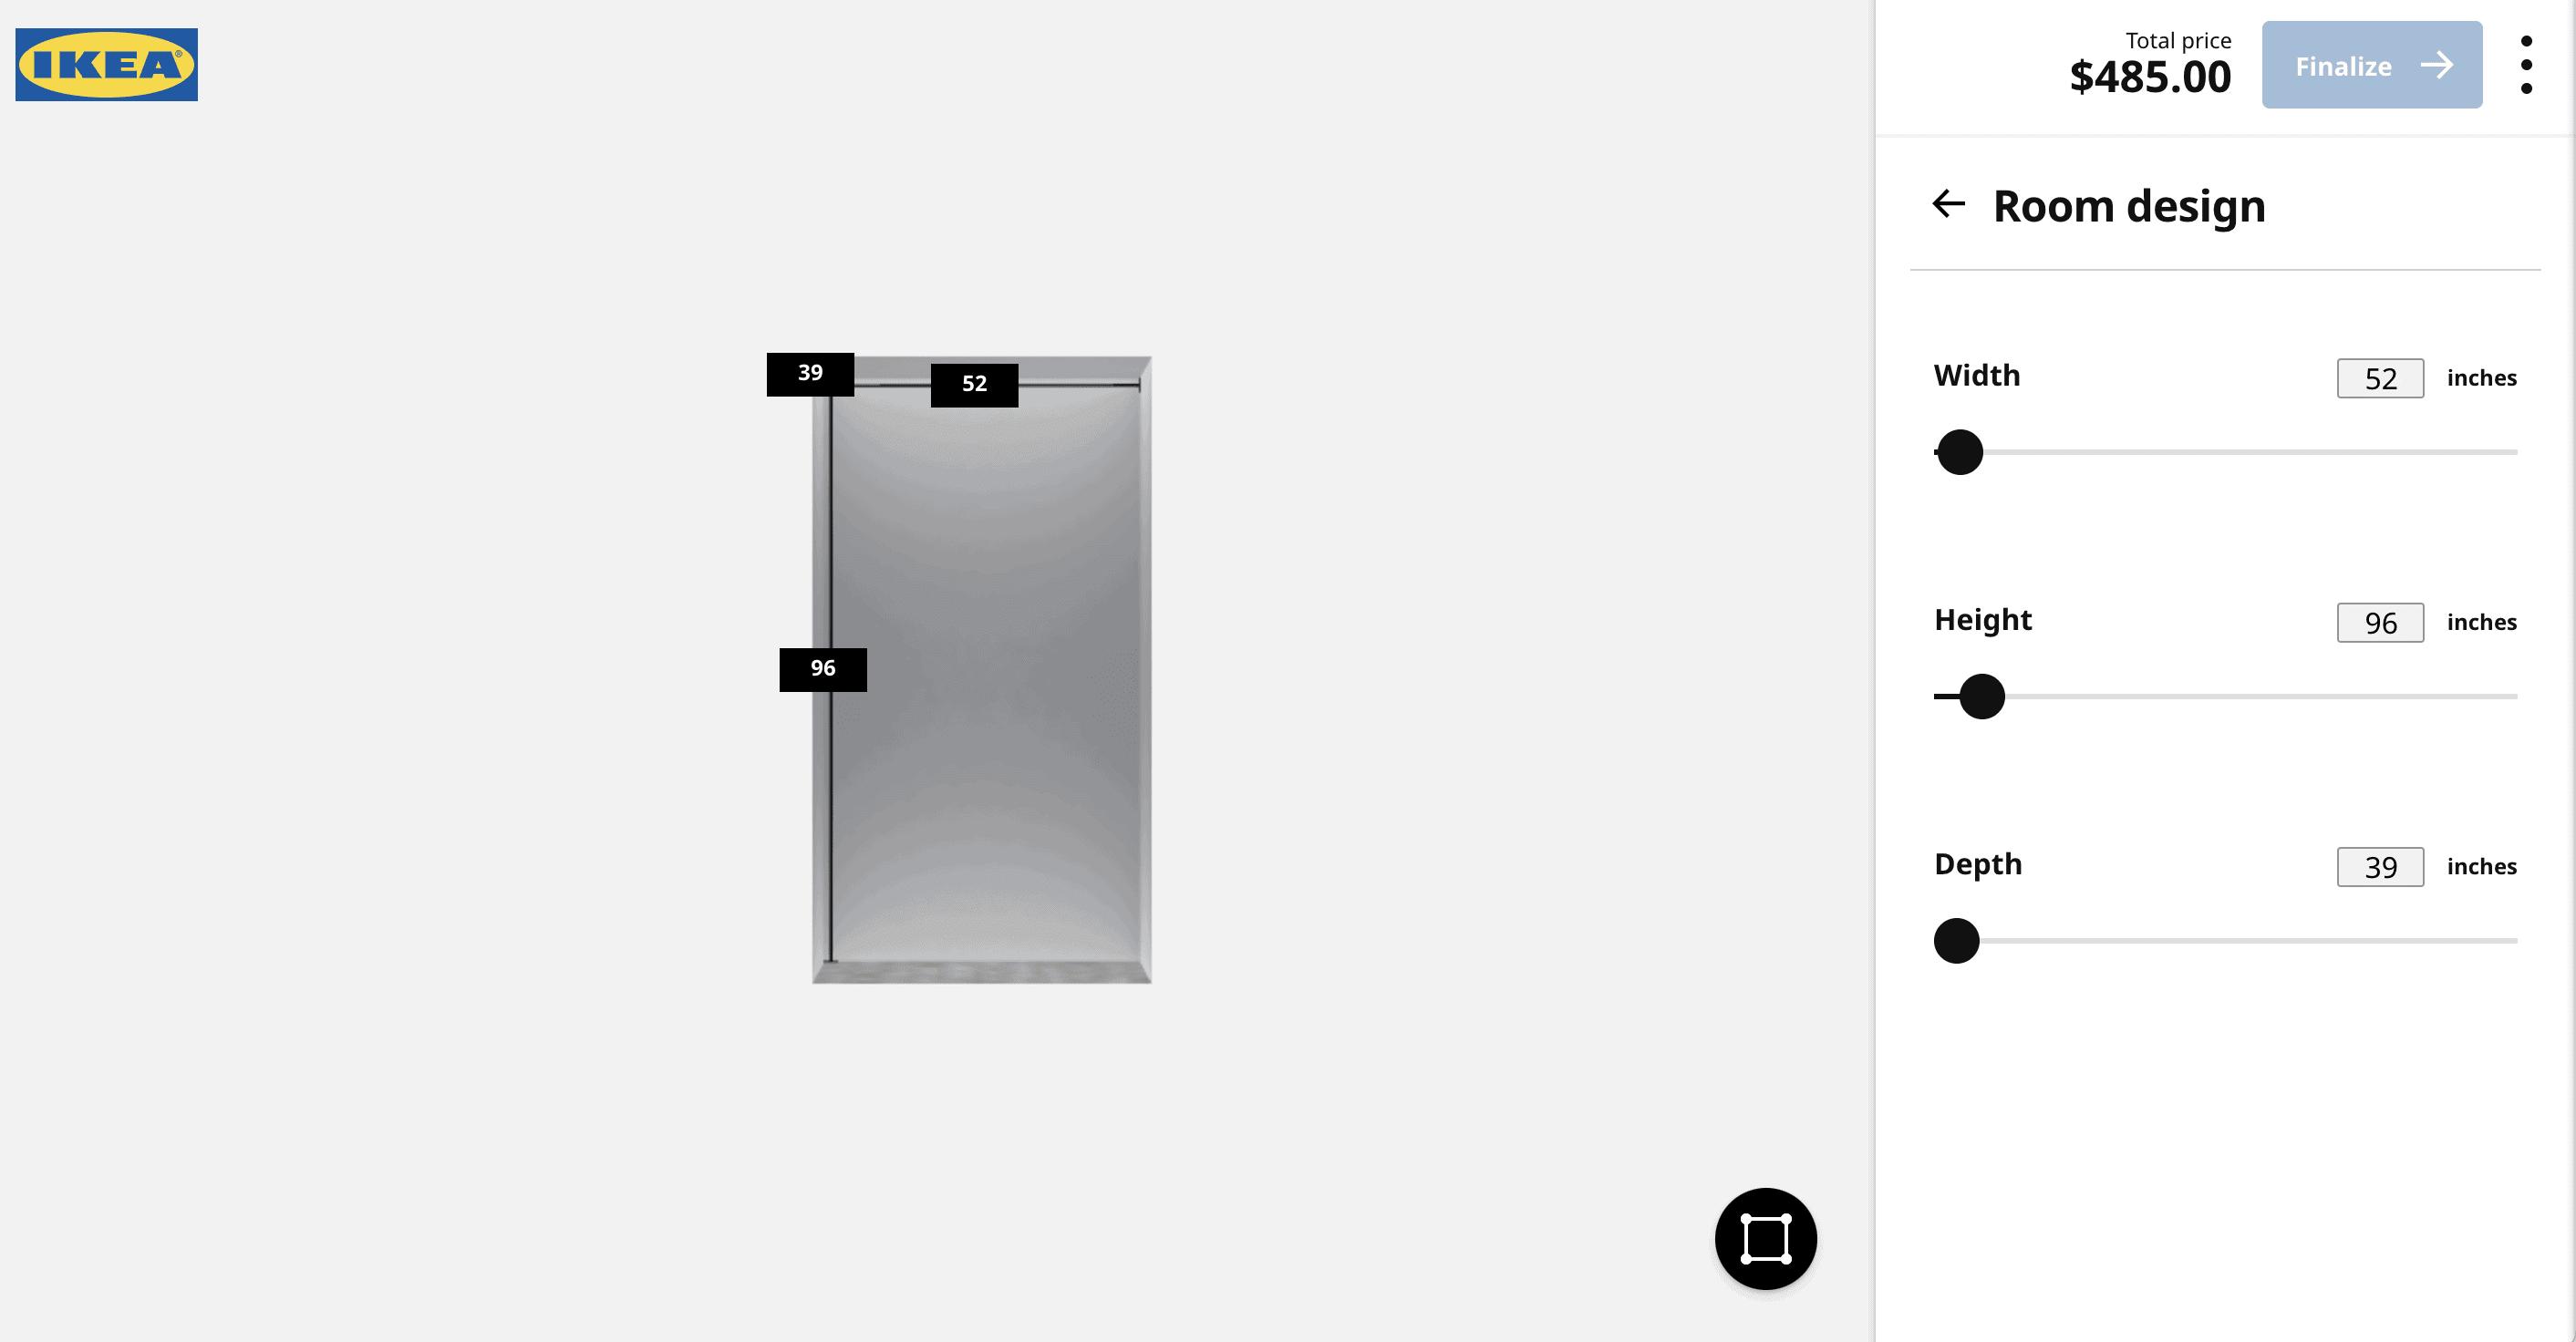 Our IKEA office closet